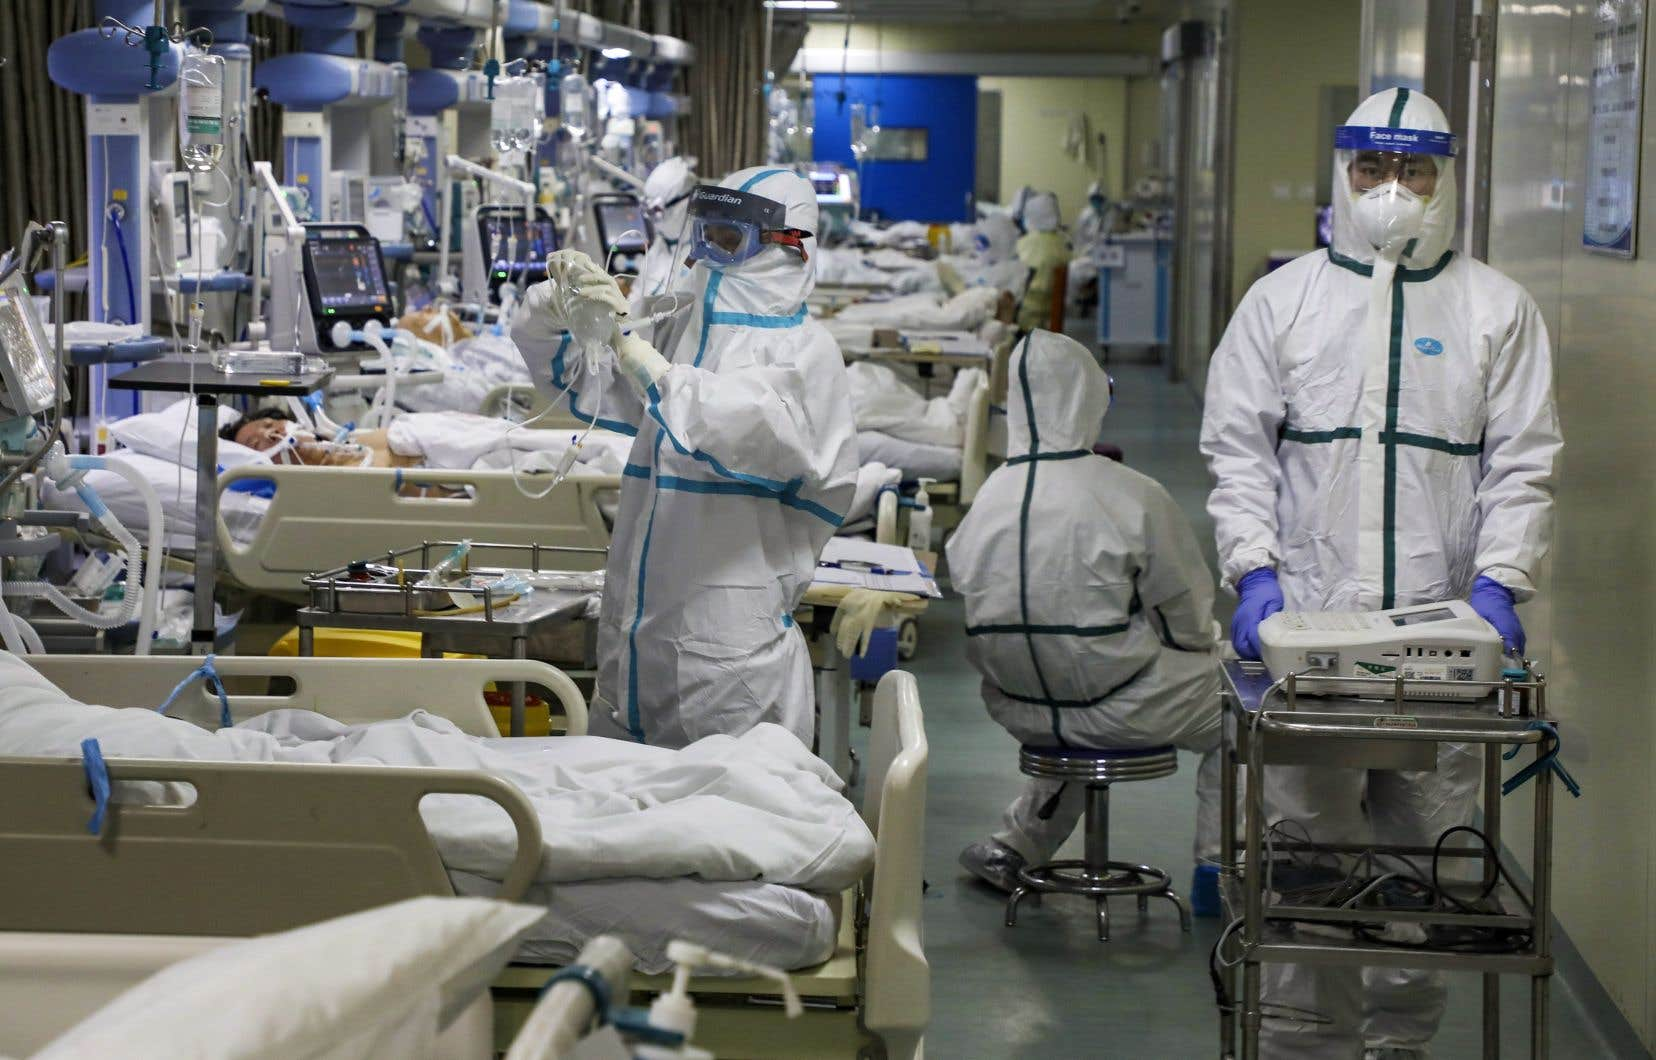 COVID-19: le coronavirus tue encore, mais la contamination ralentit | Le Devoir